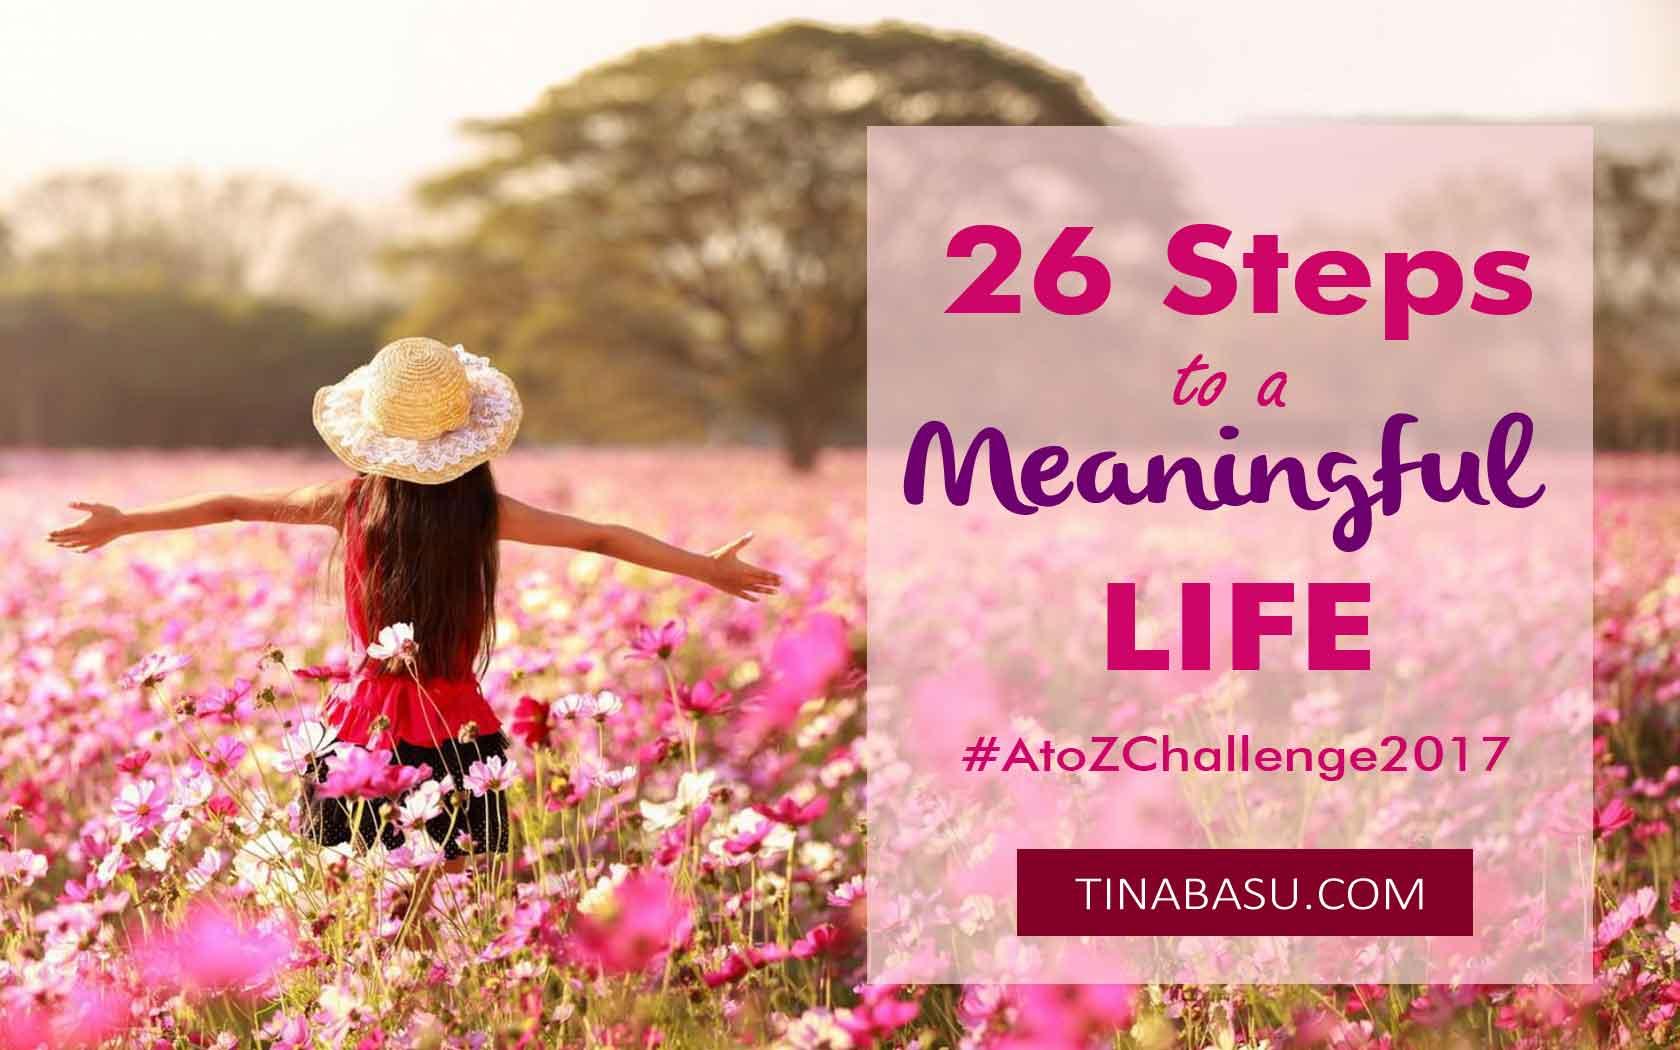 26-steps-to-meaningful-life-life-theory-positive-life-lifestyle-atozchallenge